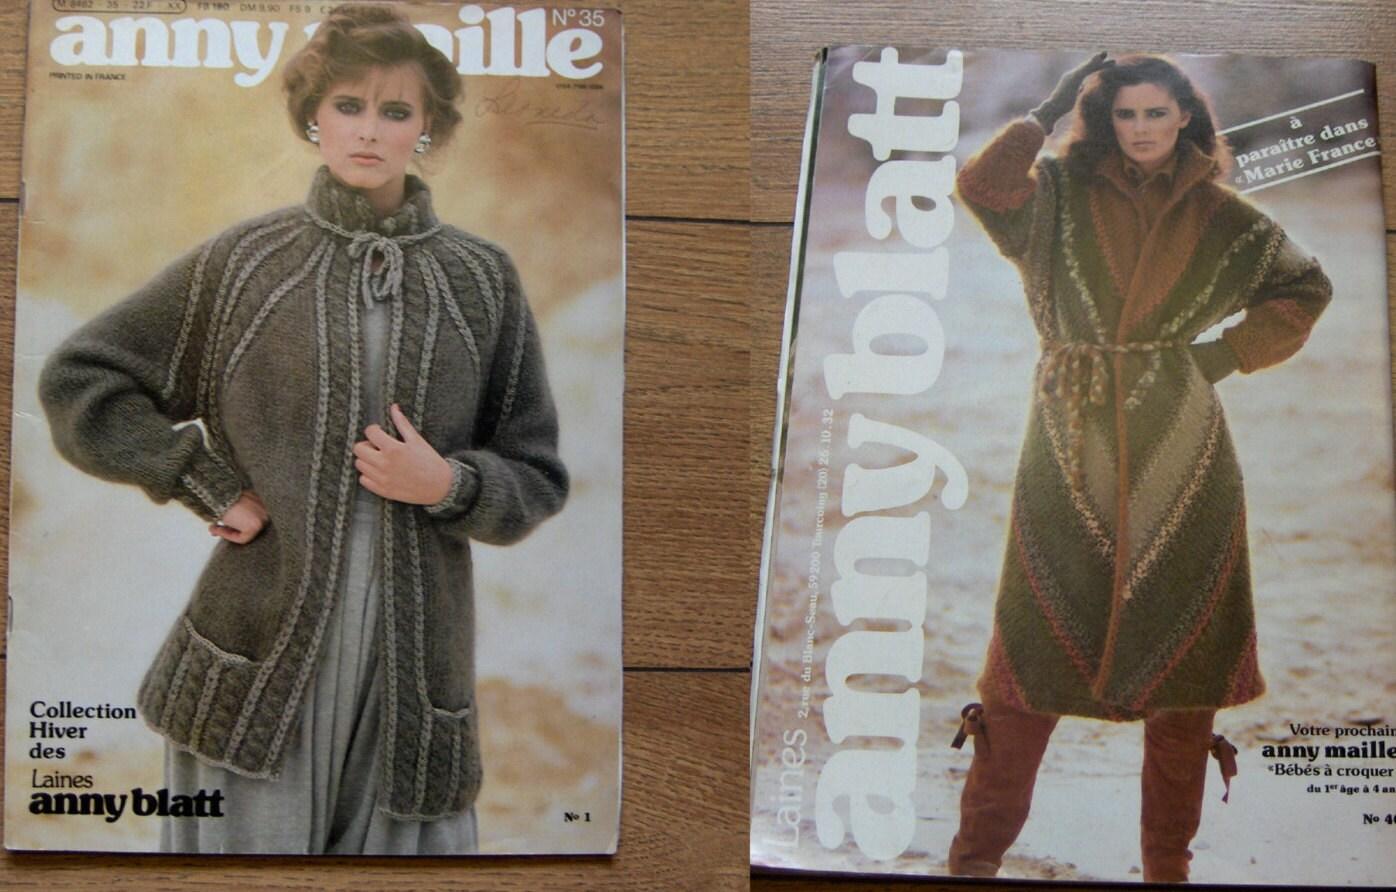 vintage 1981 knitting patterns Anny Blatt no. 35 men women